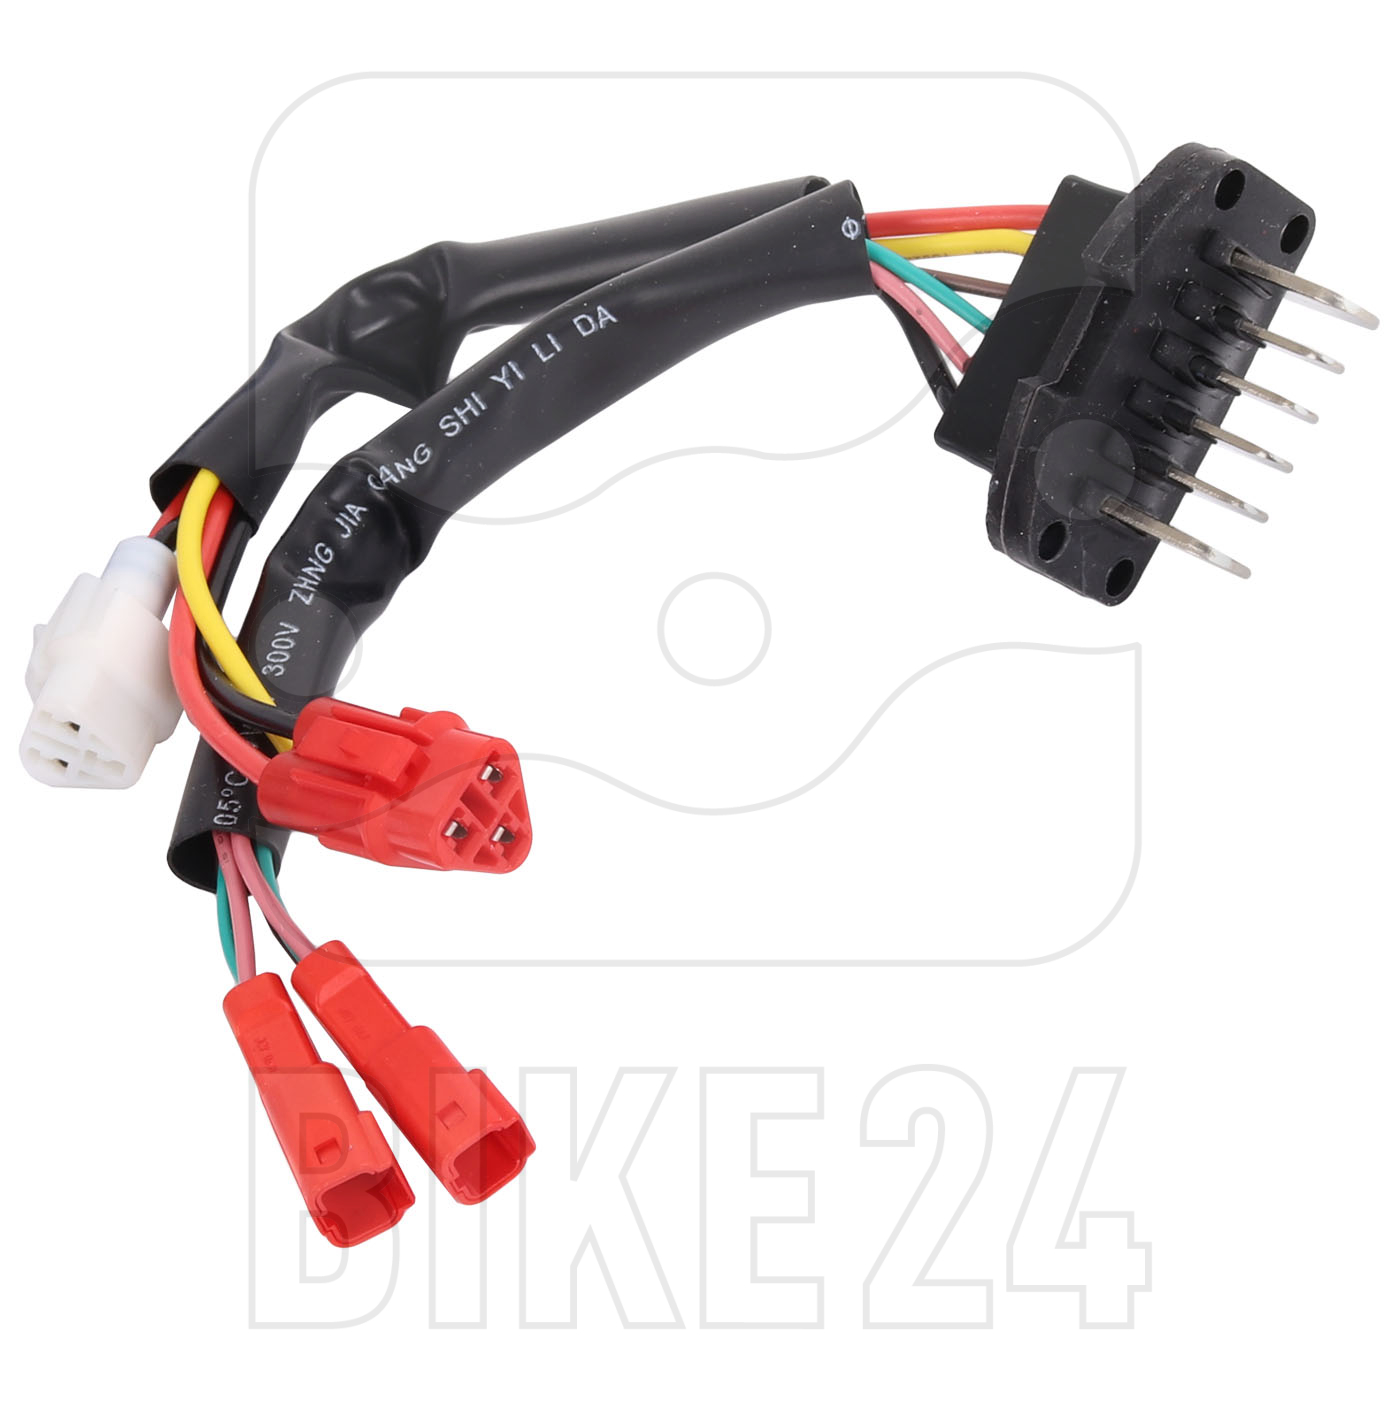 Giant Kabelstrang Batterie zu Motor MY20 (FastRoad E+ EX PRO / Thrive E+ EX PRO / Road E+ PRO / Revolt E+ PRO MY20) - 147L-HDB000-31